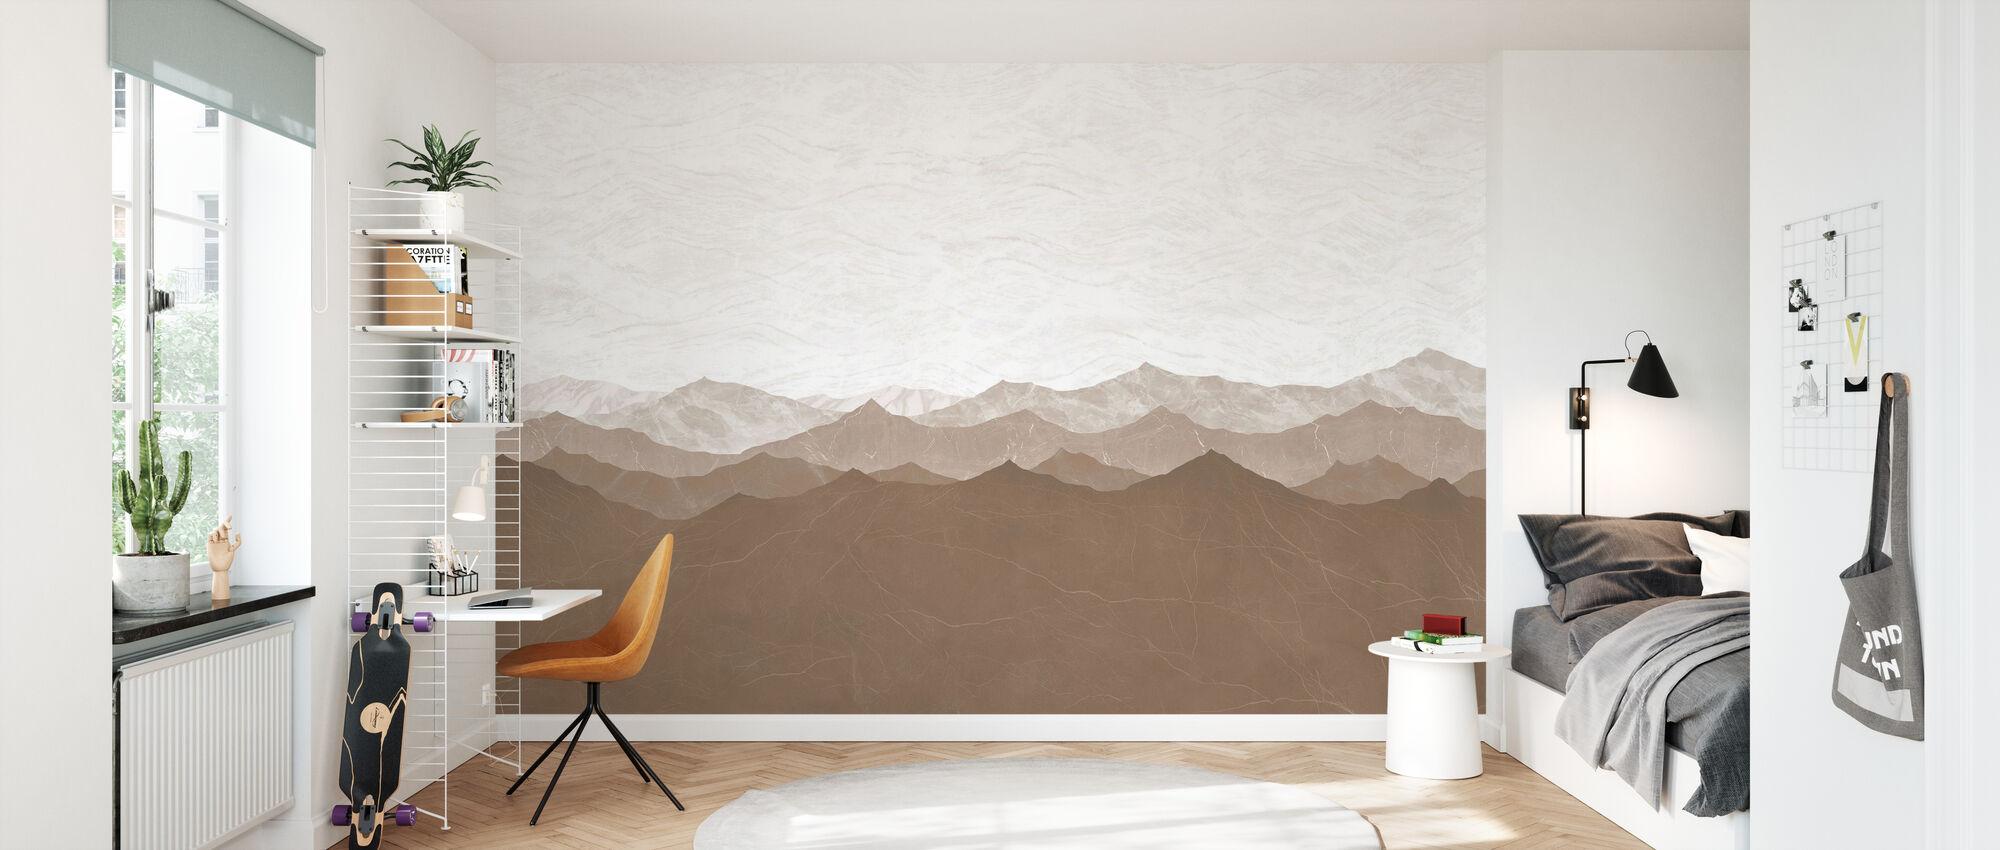 Montagne - Brown - Wallpaper - Kids Room